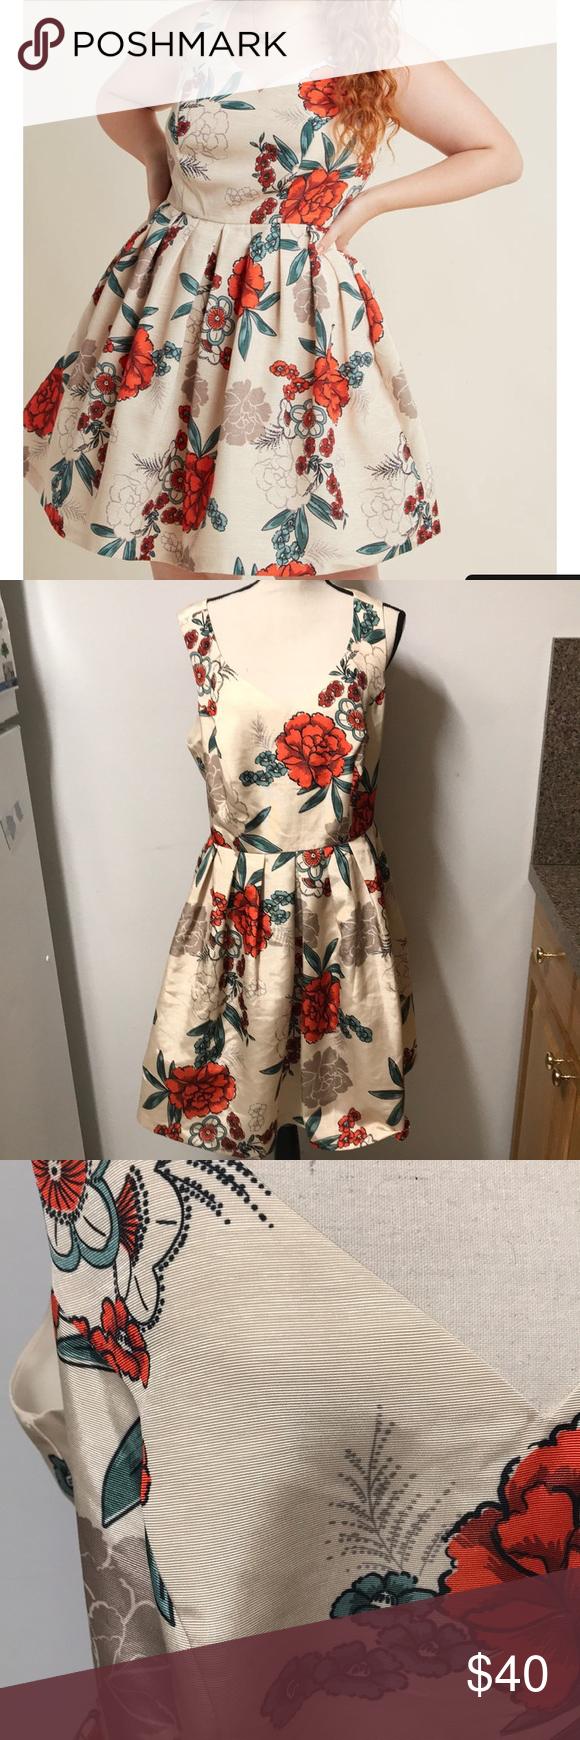 "64c96e7bb396e Modcloth elegant excellence dress size 1X Beautiful dress, like new. ""We  can'"